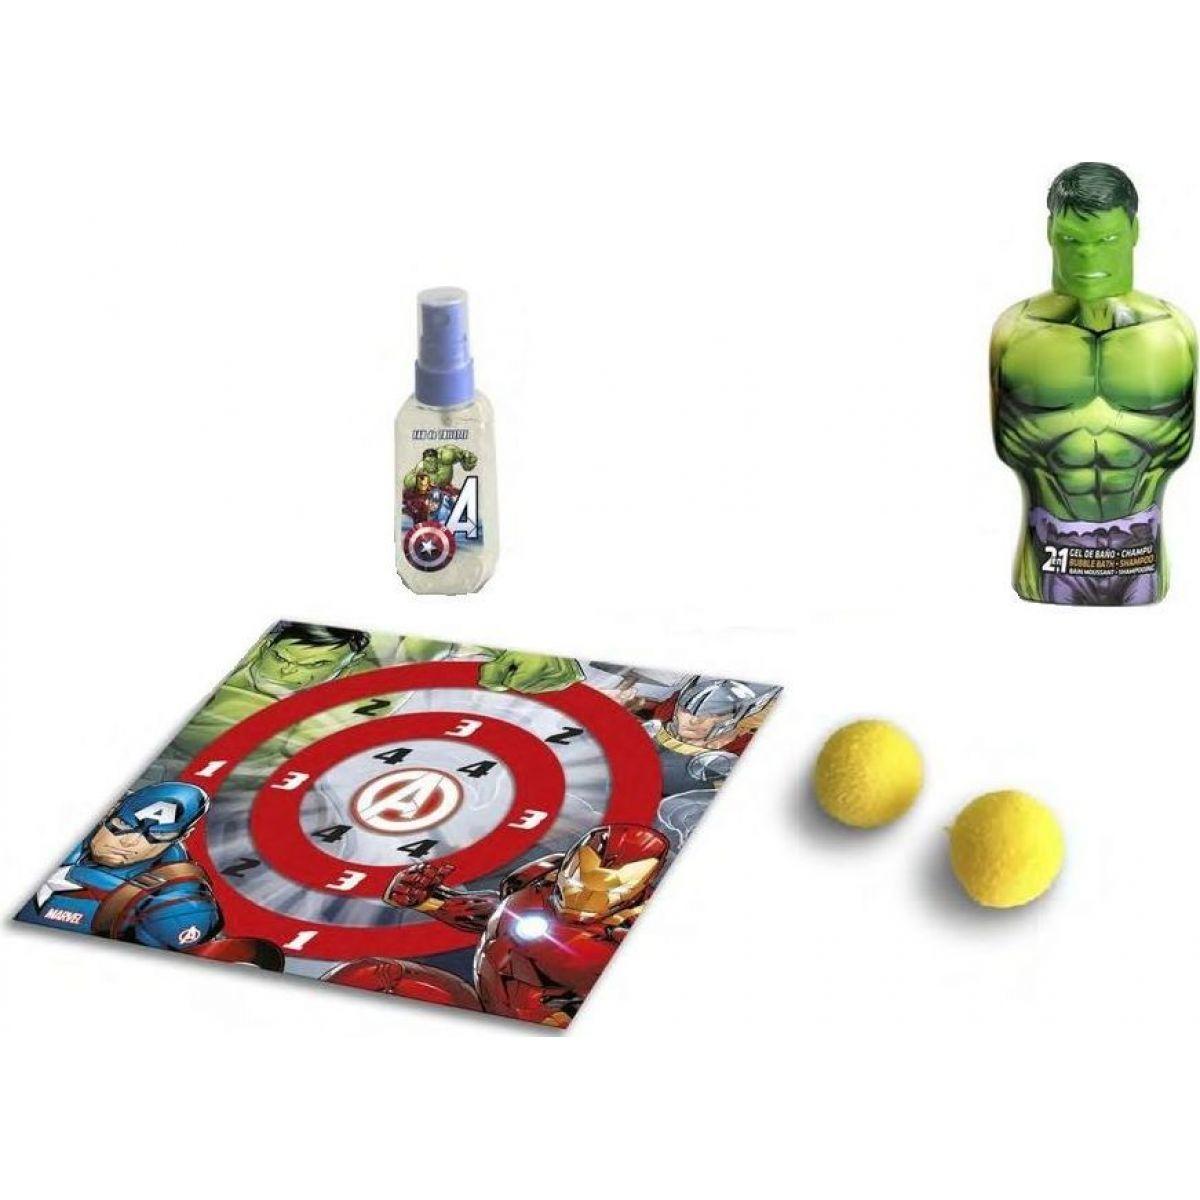 Avengers darčeková sada Hulk